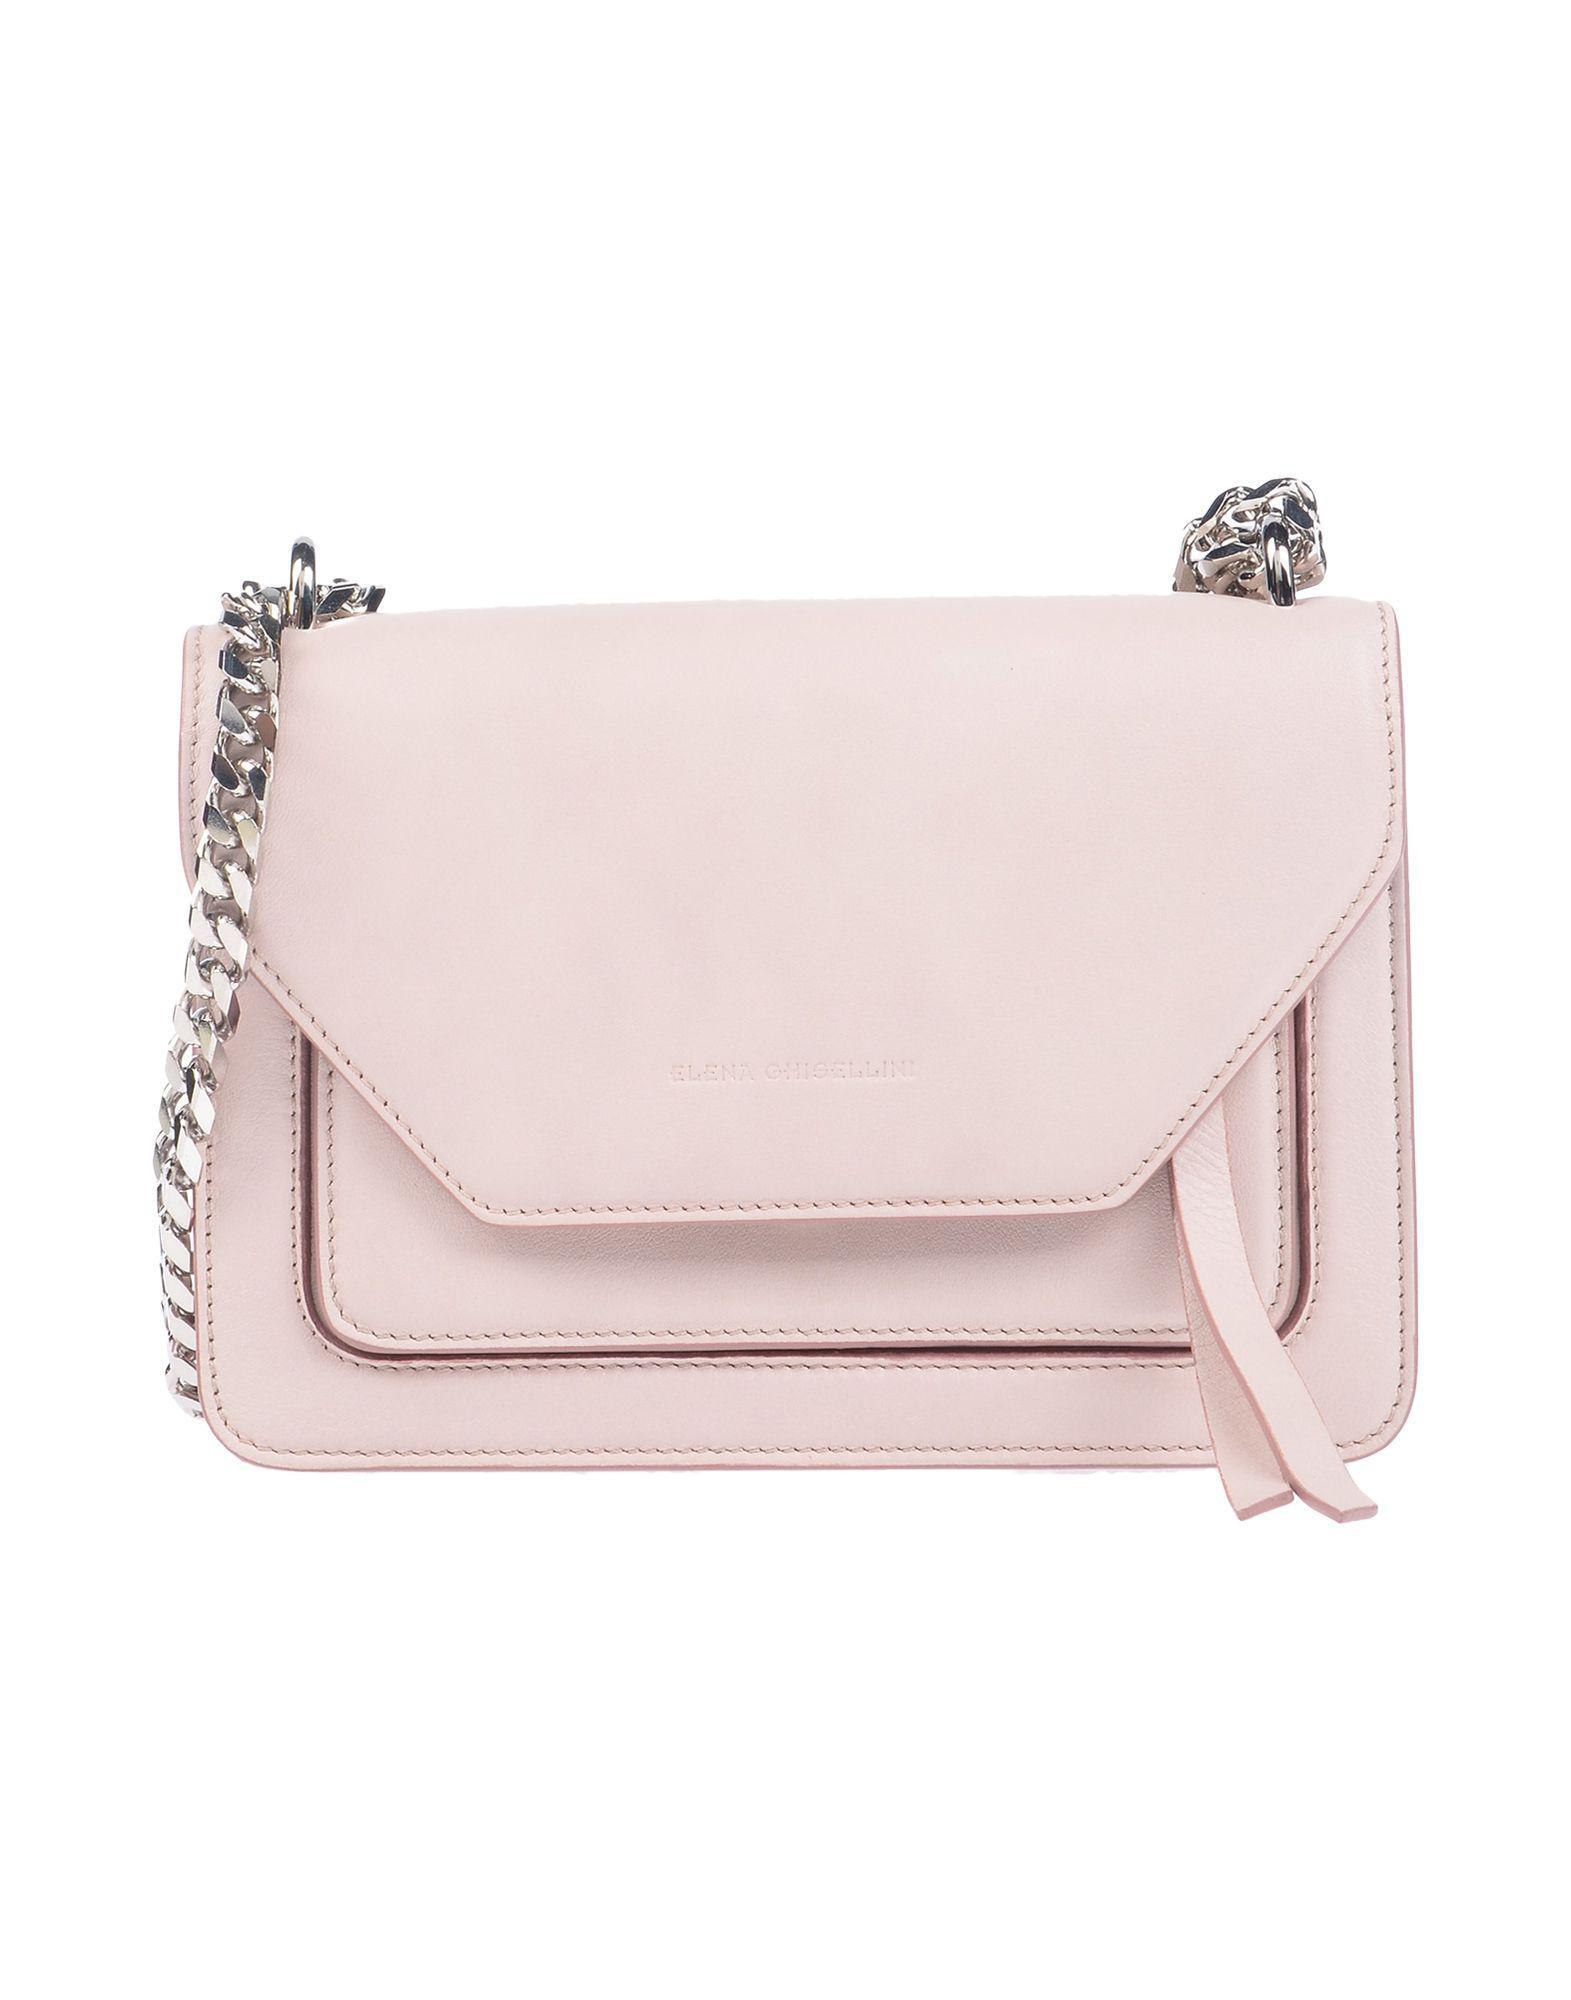 28723c25c375 Lyst - Elena Ghisellini Shoulder Bag in Pink - Save 27%